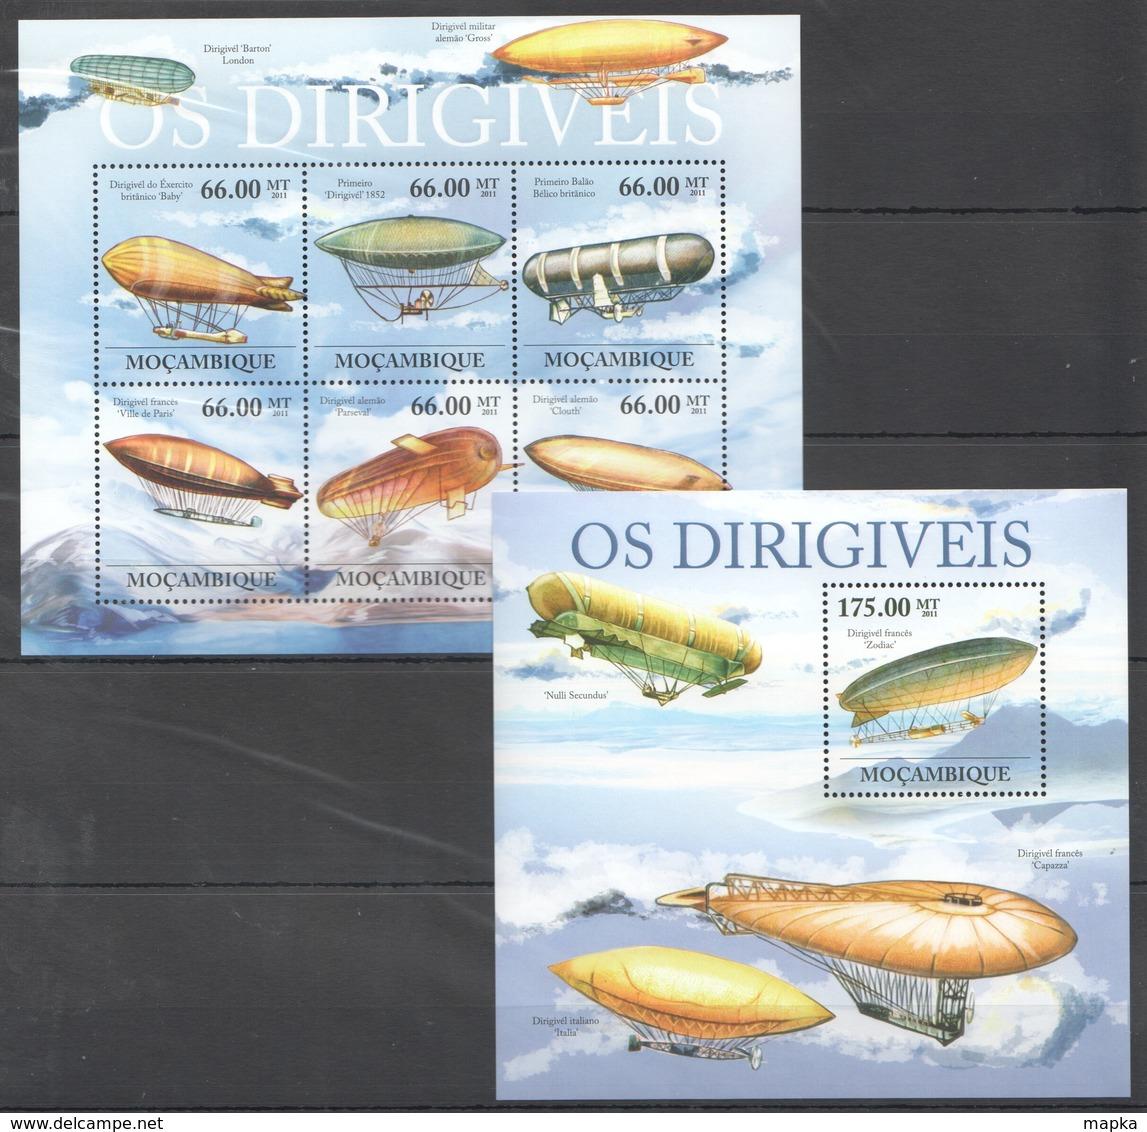 U601 2011 MOCAMBIQUE AVIATION OS DIRIGIVEIS 1SH+1BL MNH - Zeppelins